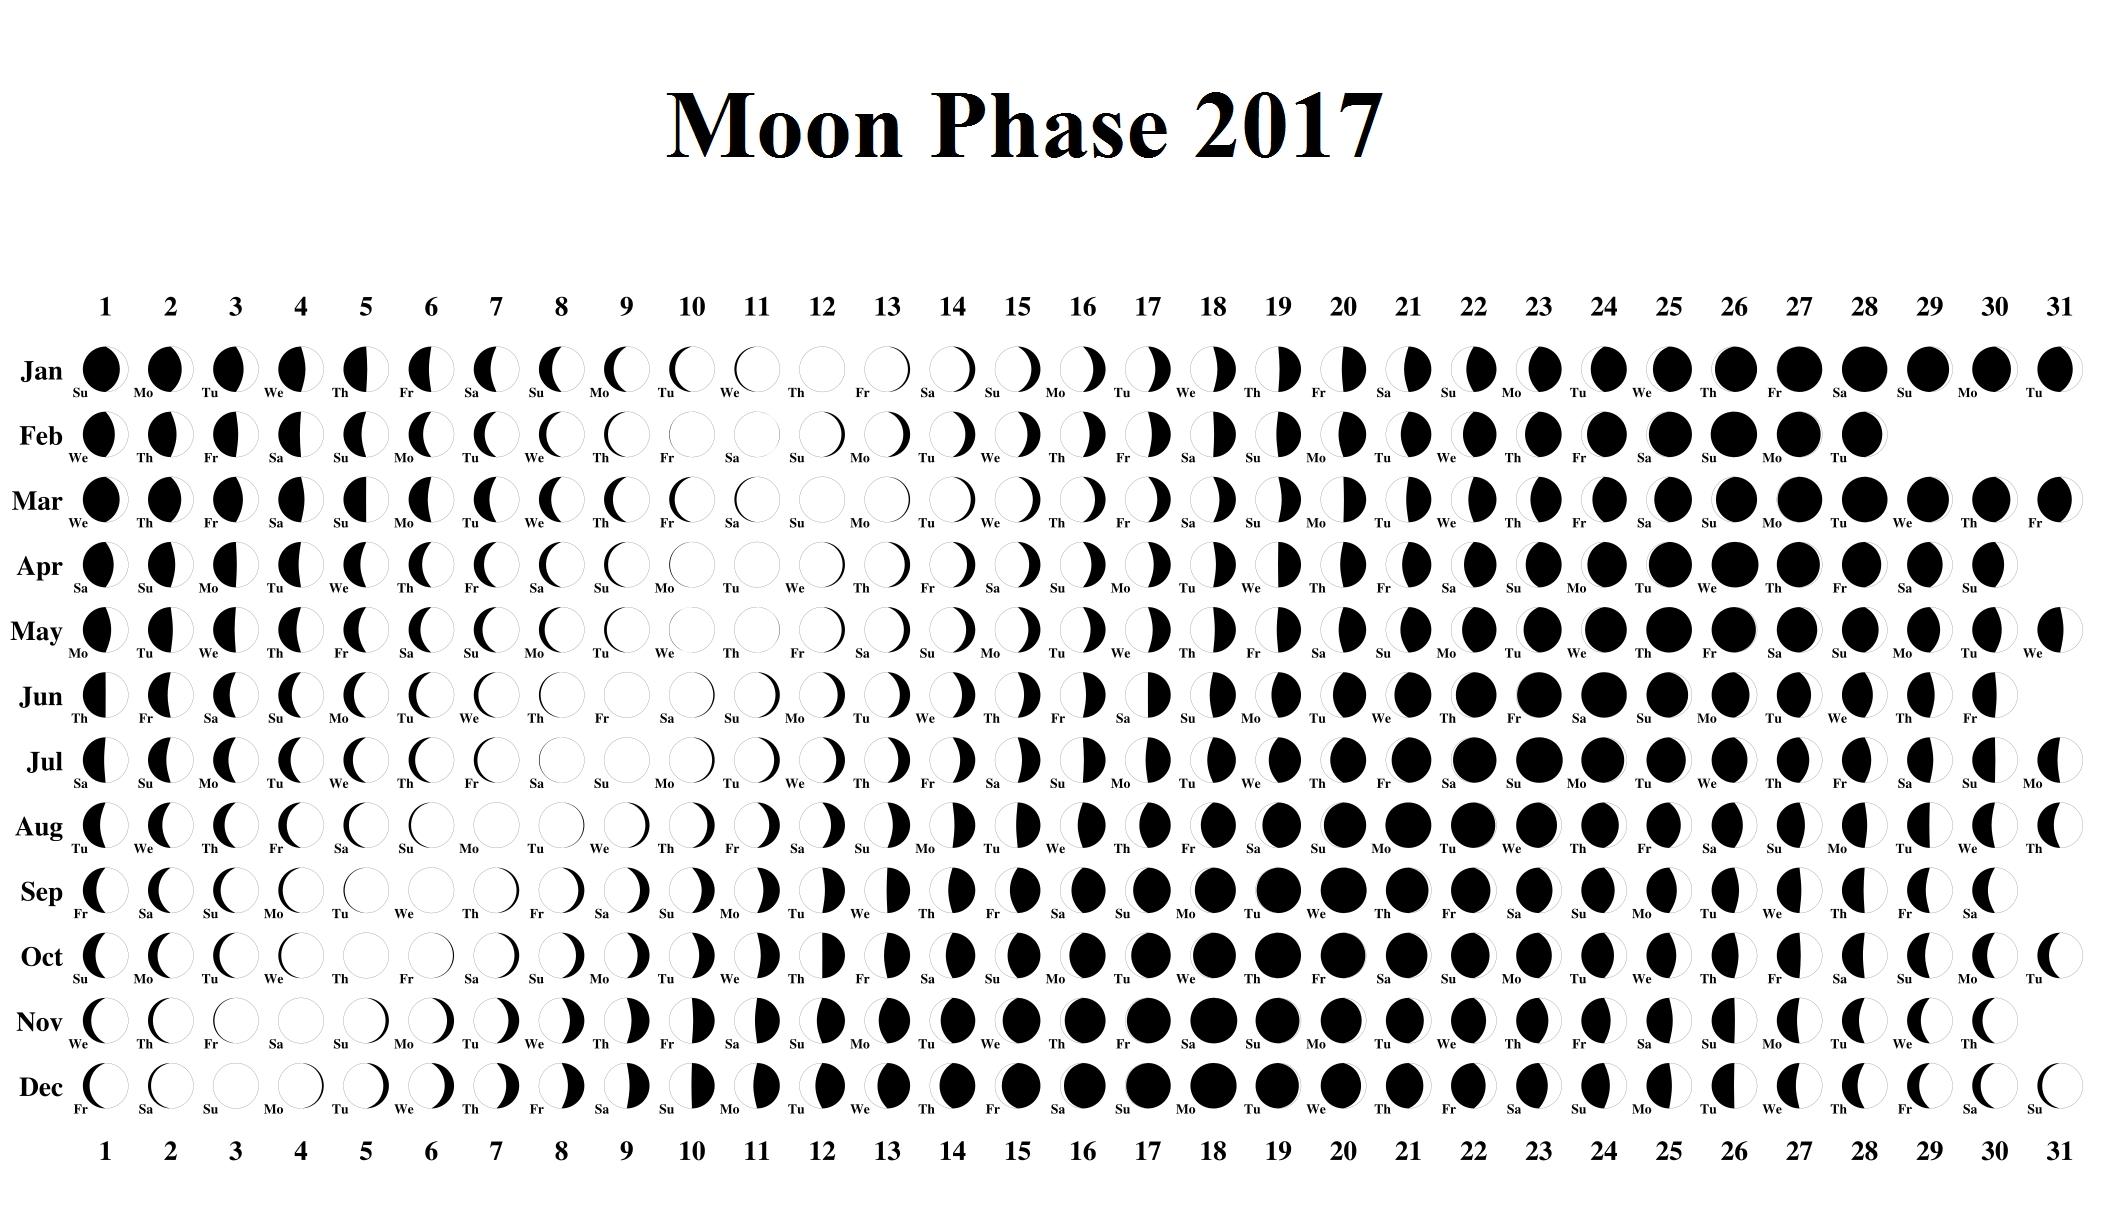 Moon Phase Calendar Lunar Template 2017 | Moon Phase Calendar 2017 within Phases Of The Moon Calendar